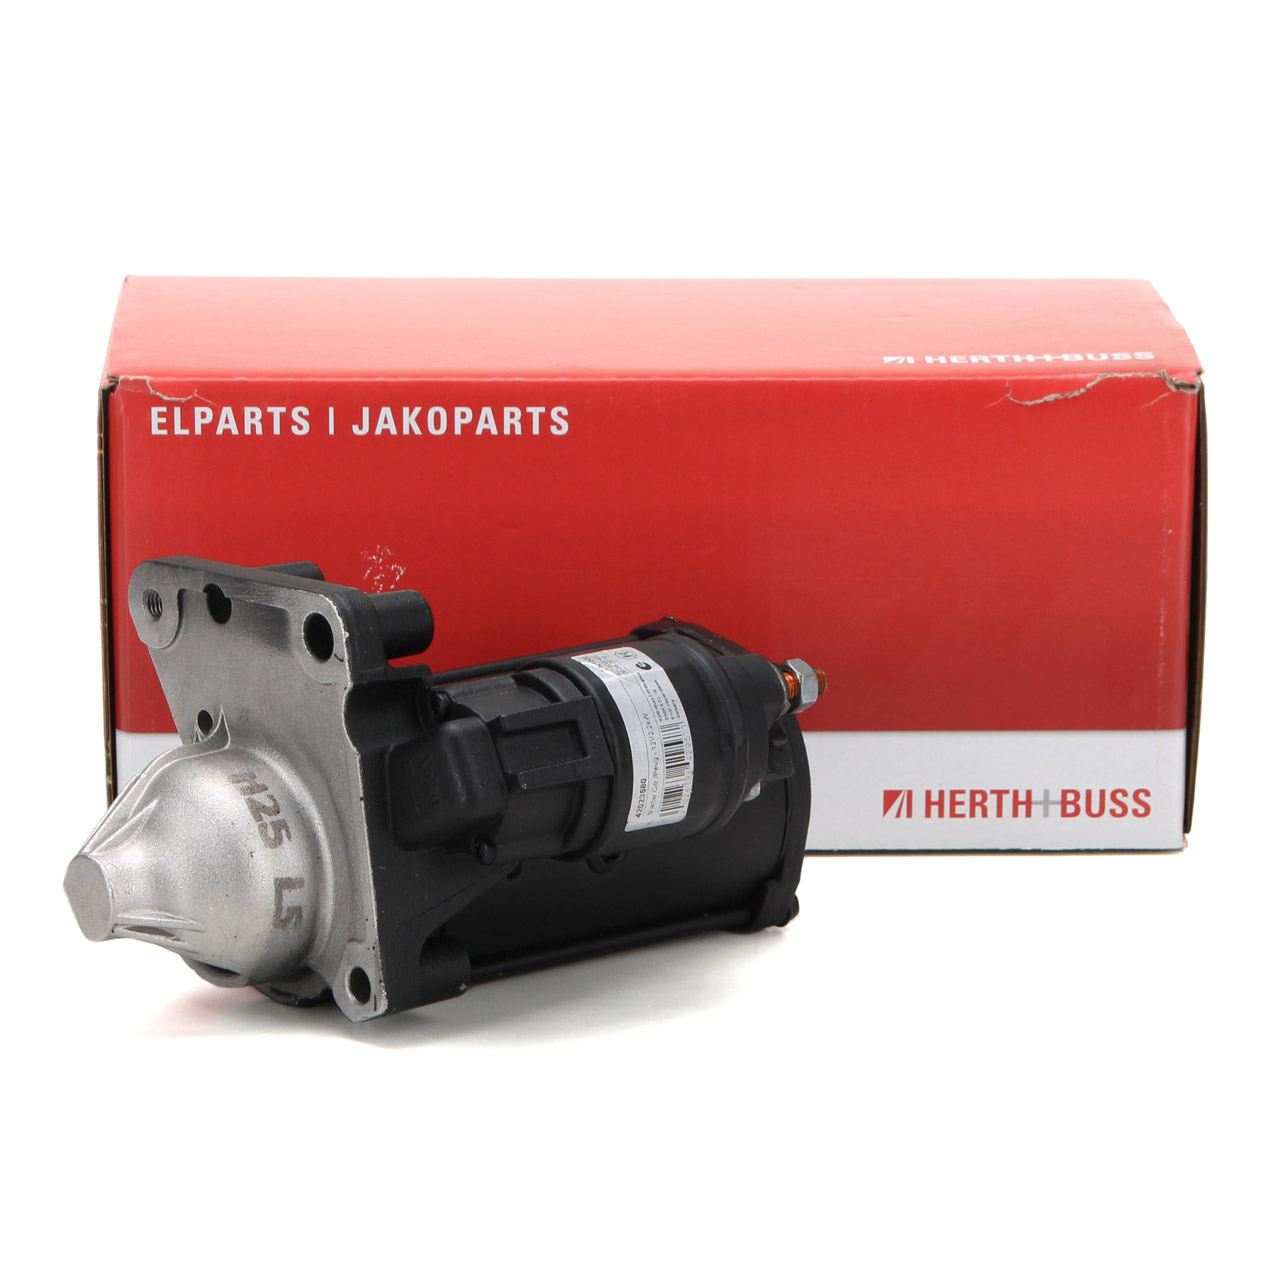 HERTH+BUSS ELPARTS Anlasser 12V 2,2kW CITROEN C3 C4 PEUGEOT 206 207 208 307